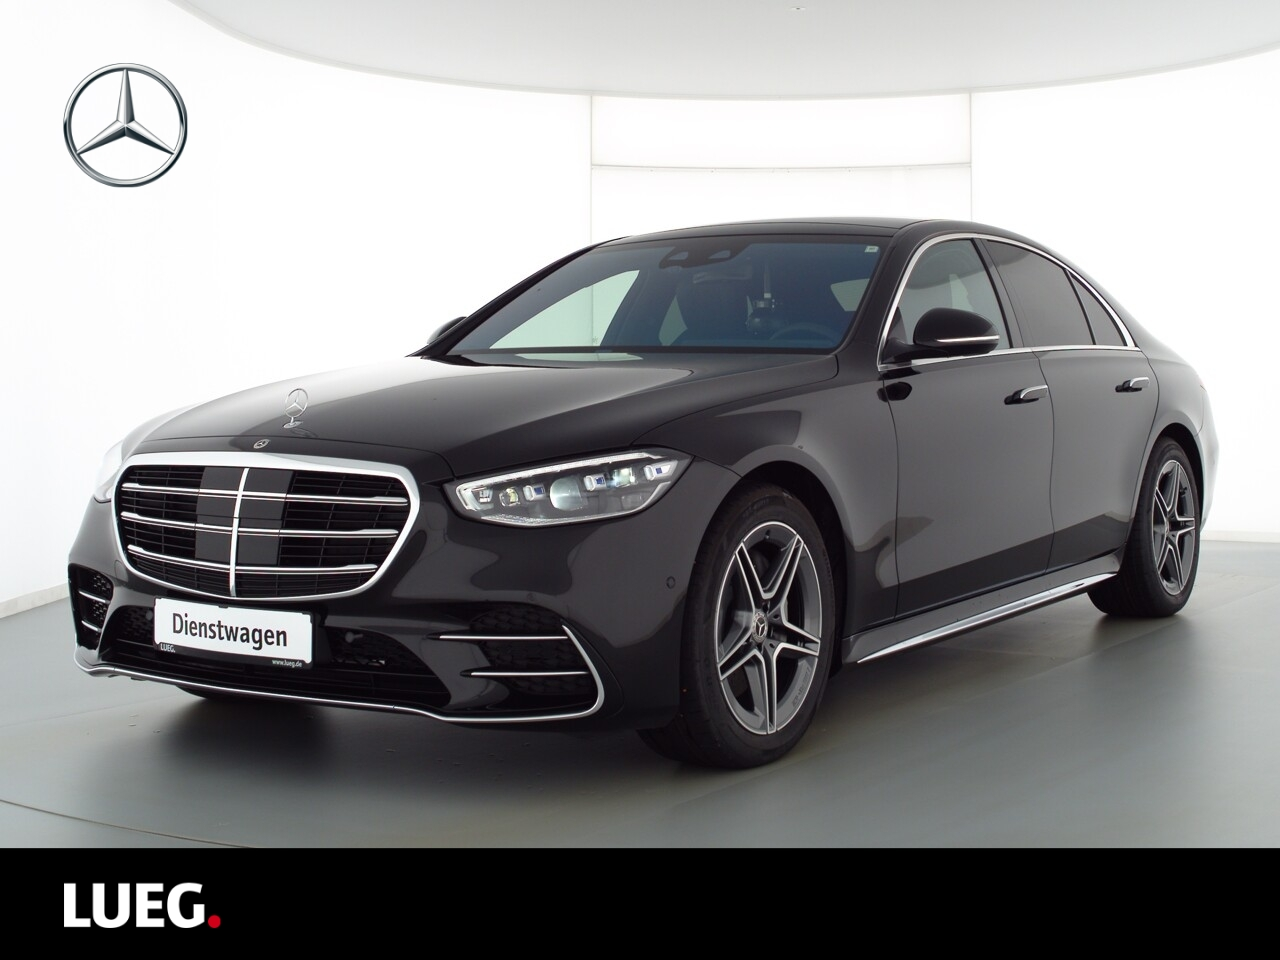 Mercedes-Benz S 350 d 4M AMG+DIGIT.LIGHT+AR-HUD+PANO+KEYLESS, Jahr 2021, Diesel